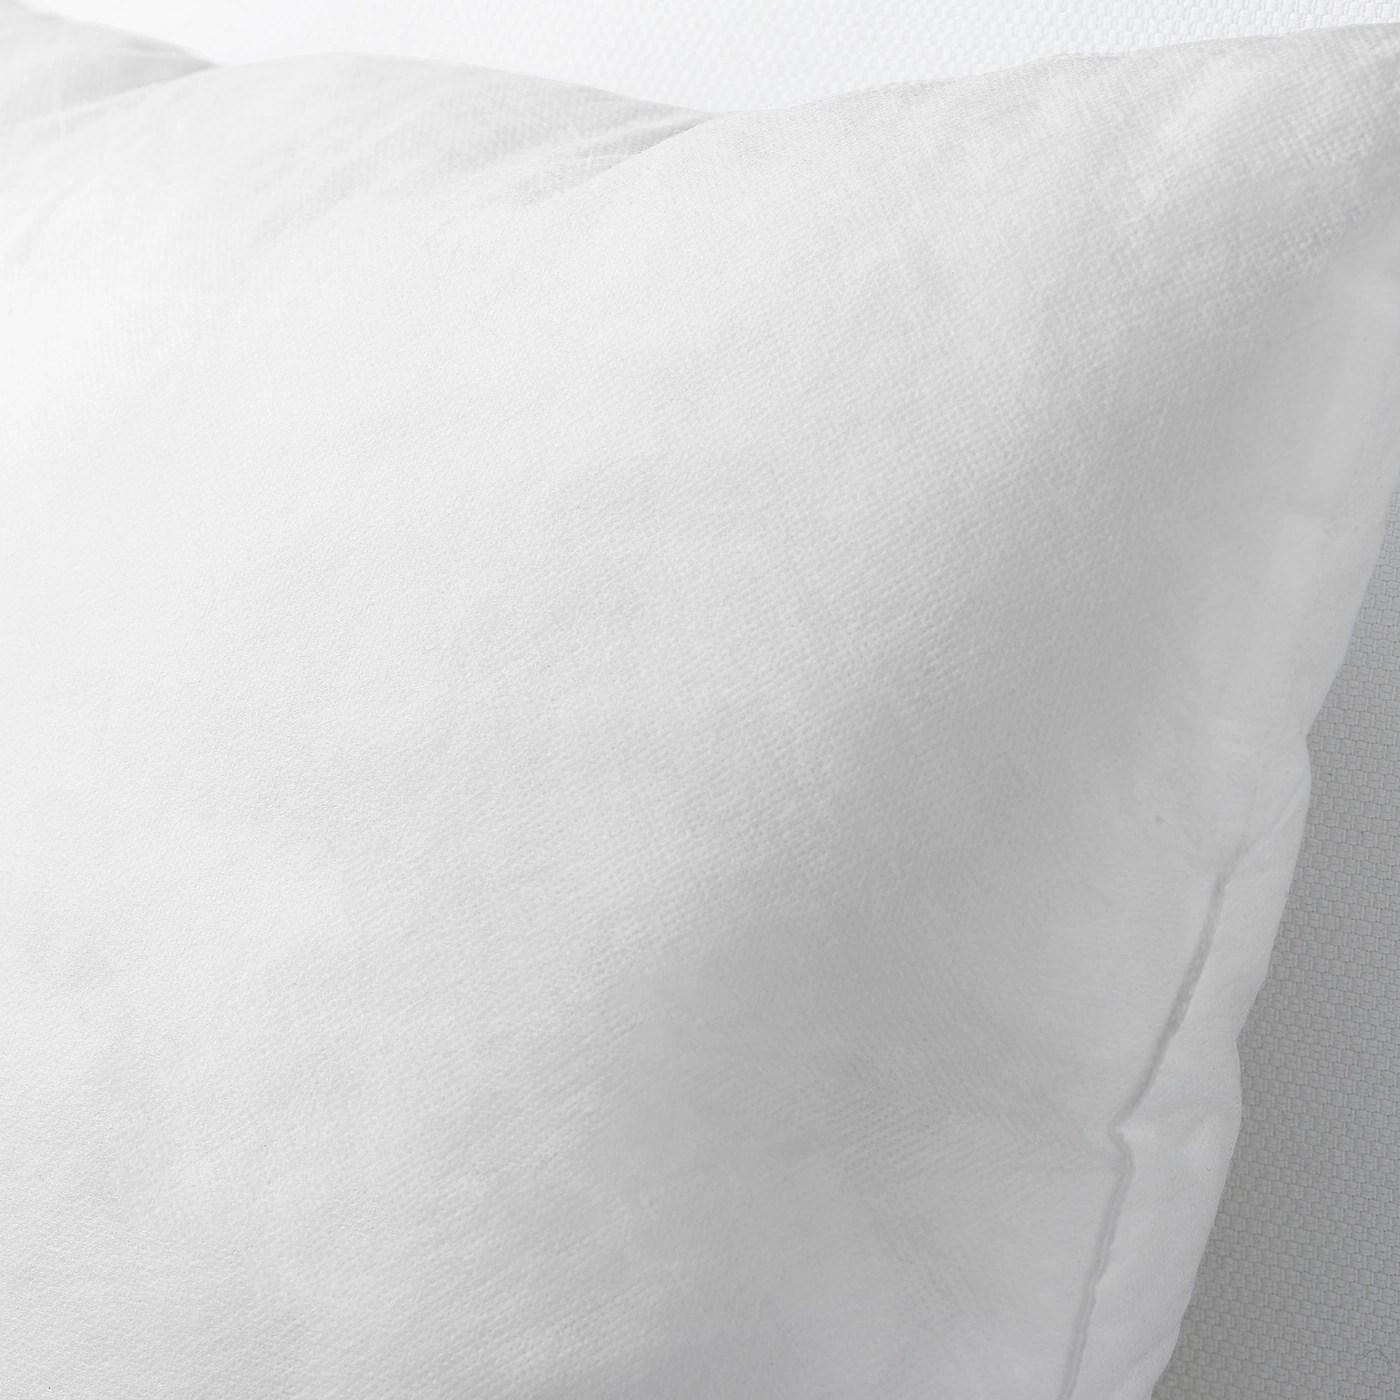 inner coussin a recouvrir blanc 26x26 65x65 cm